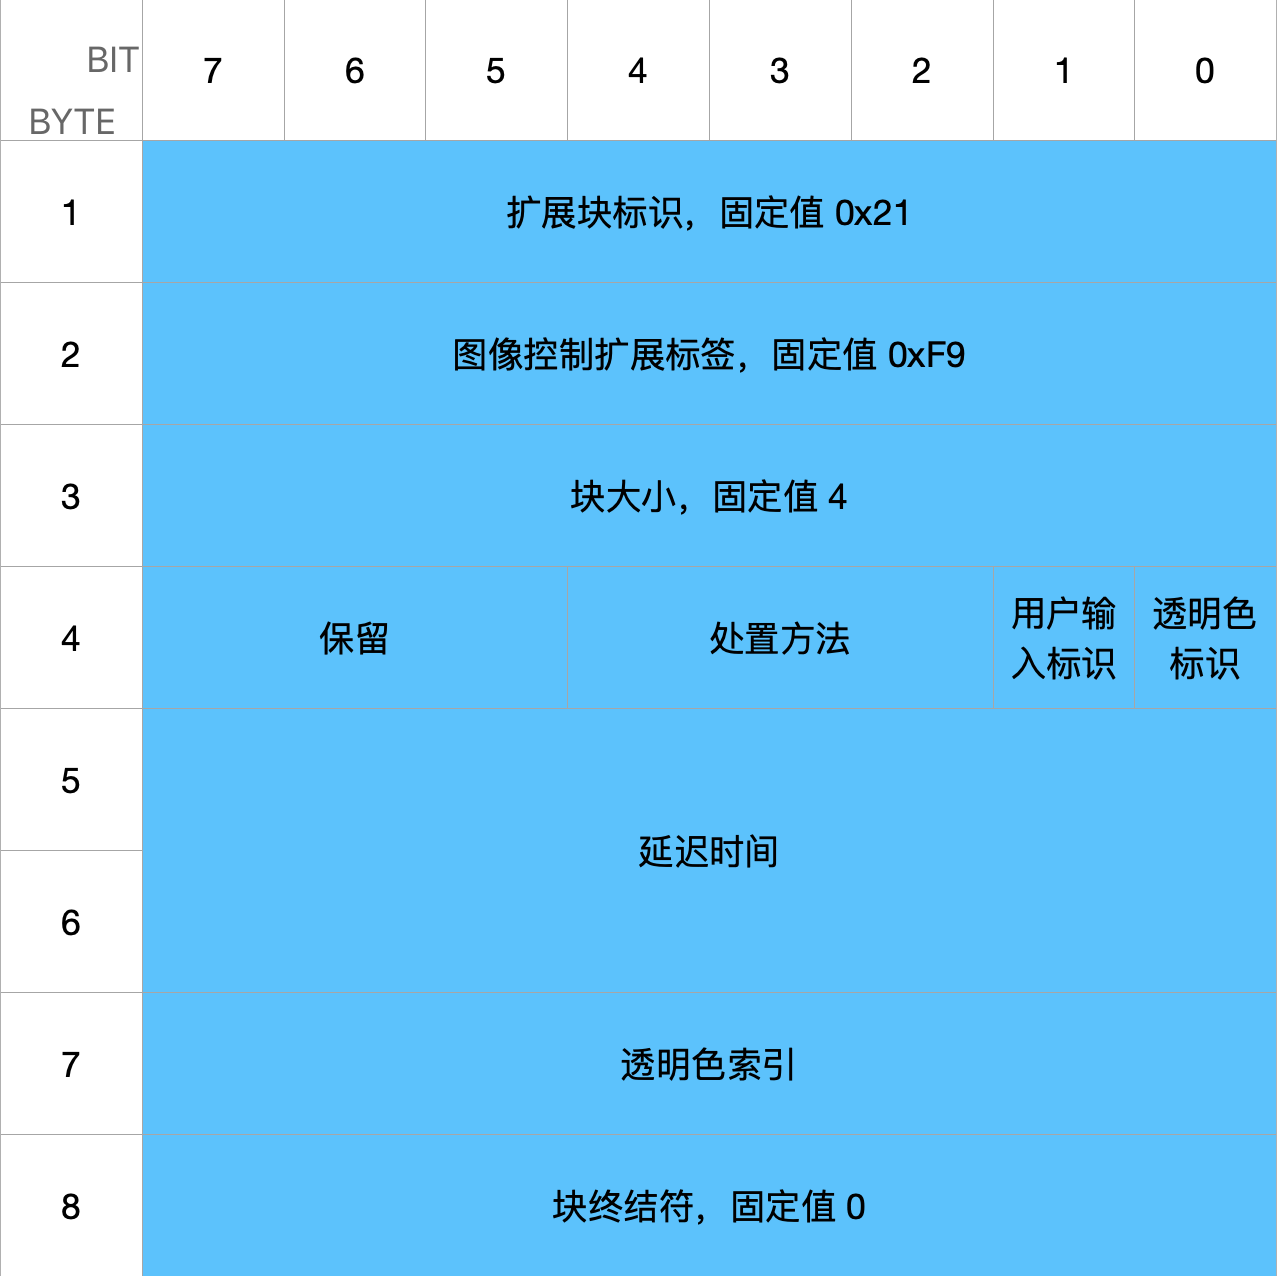 (5) 图形控制扩展(Graphic Control Extension)